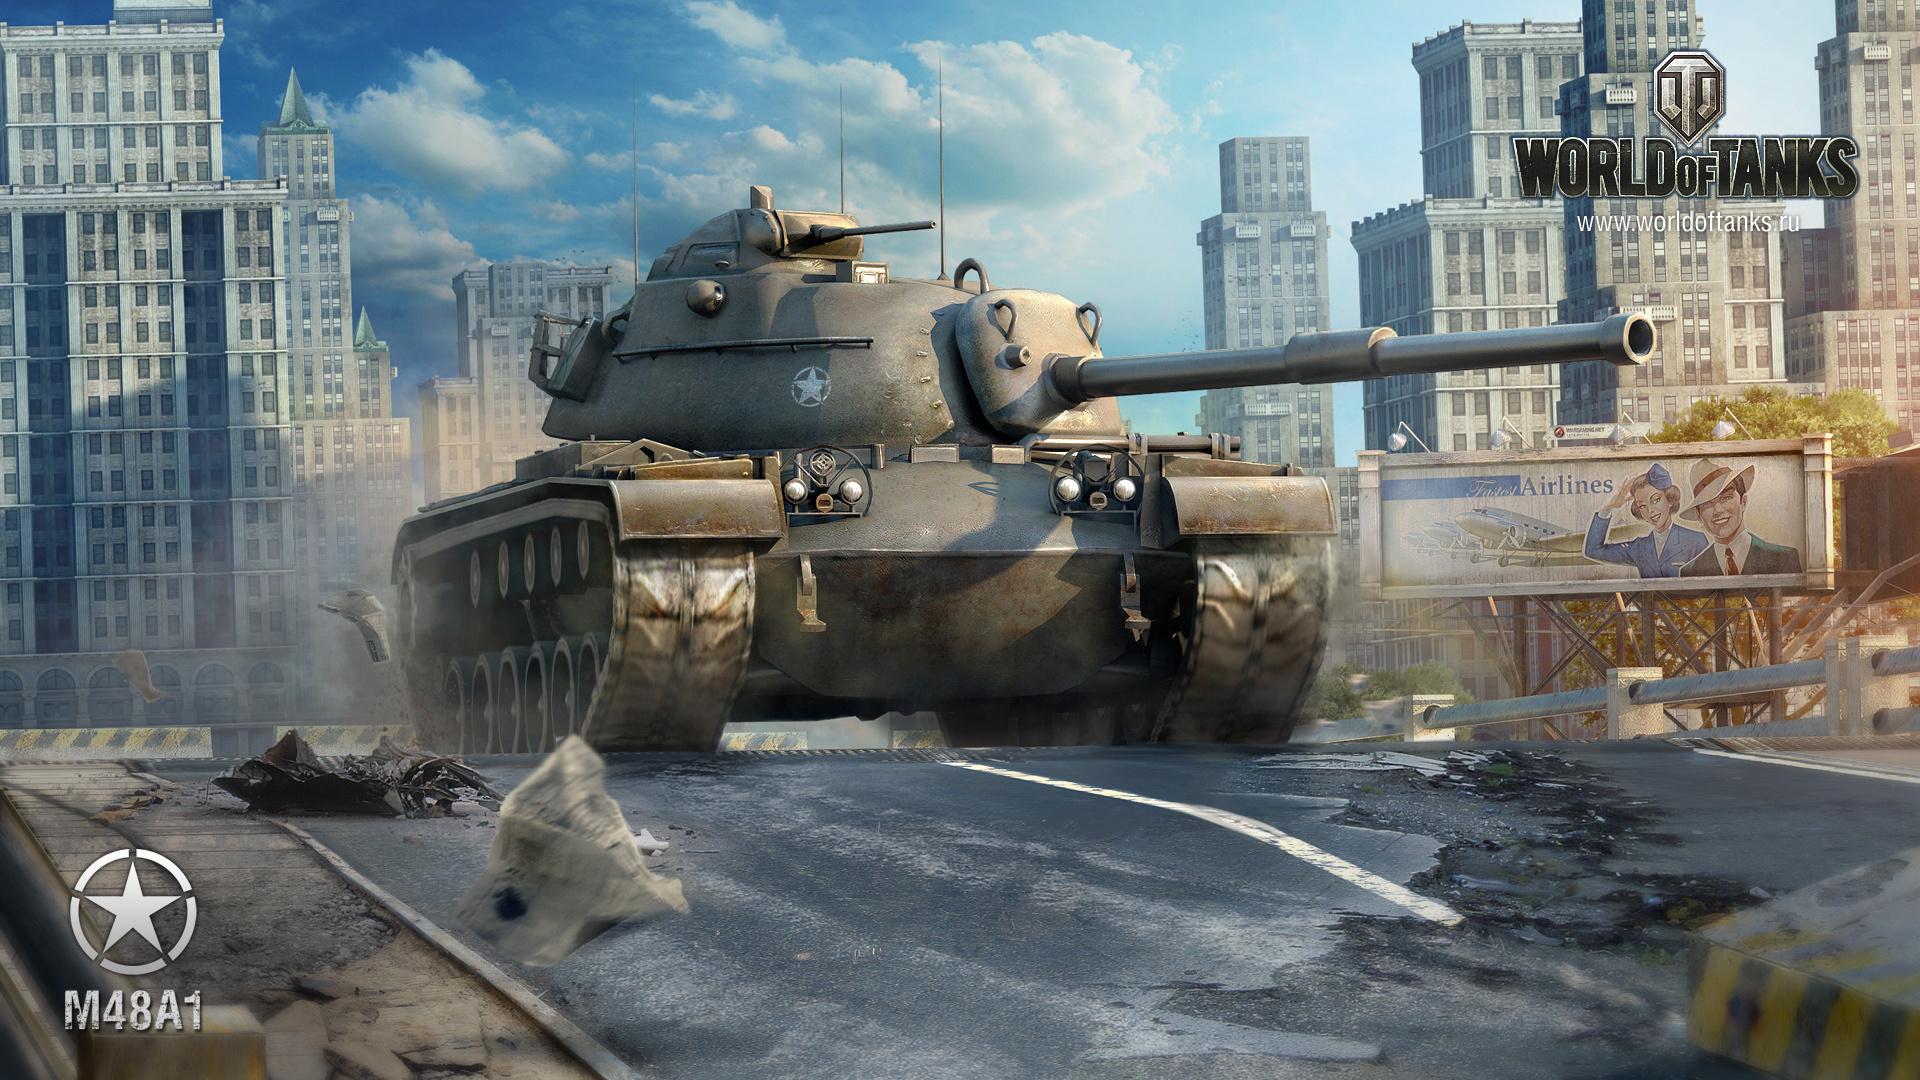 wiorld of tanks